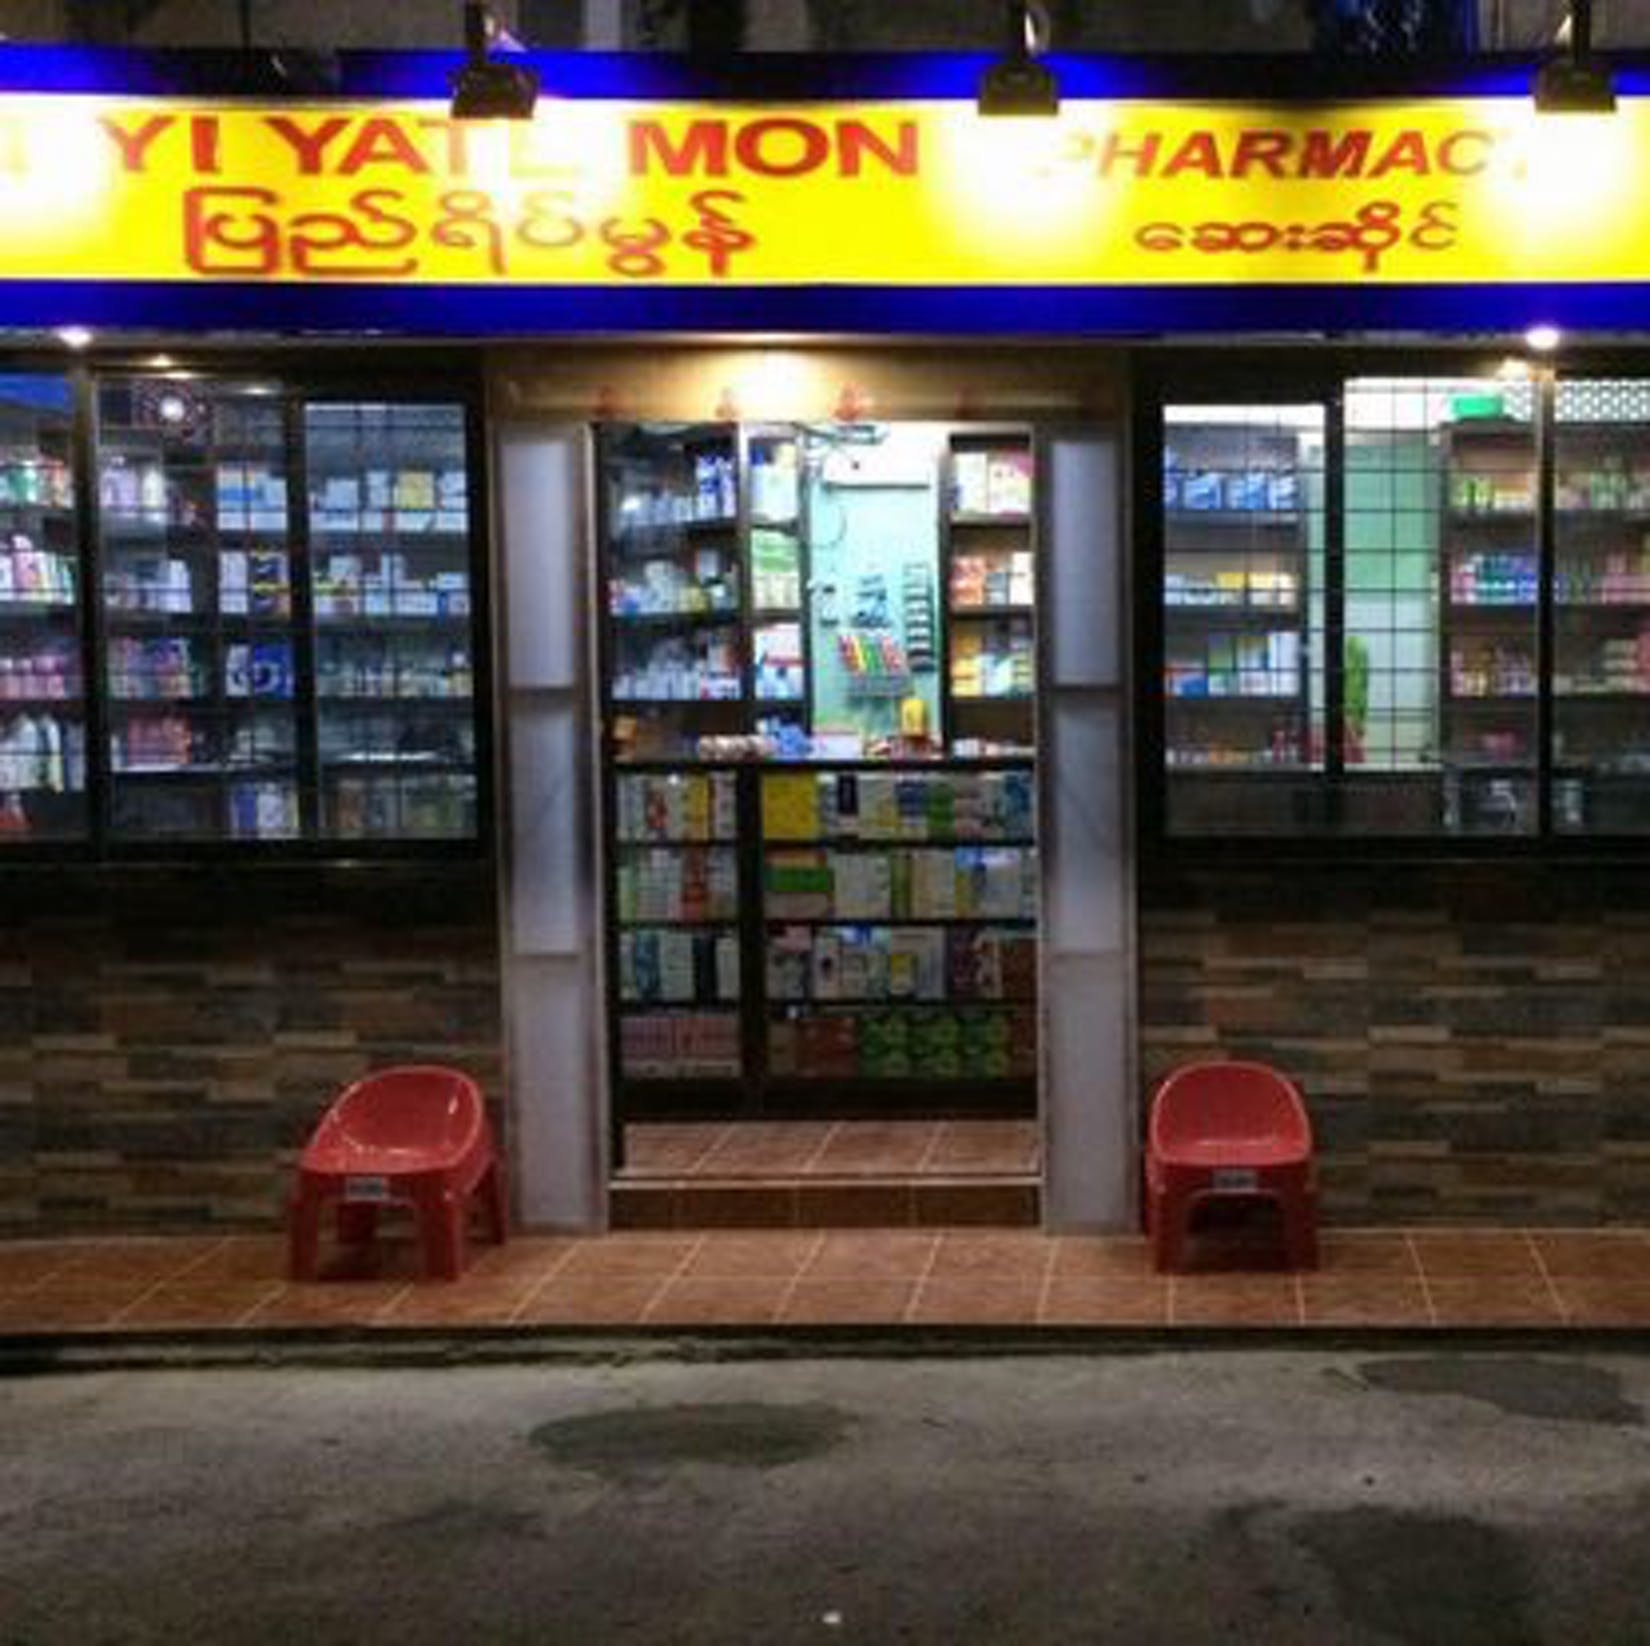 Pyi Yate Mon Pharmacy | Beauty